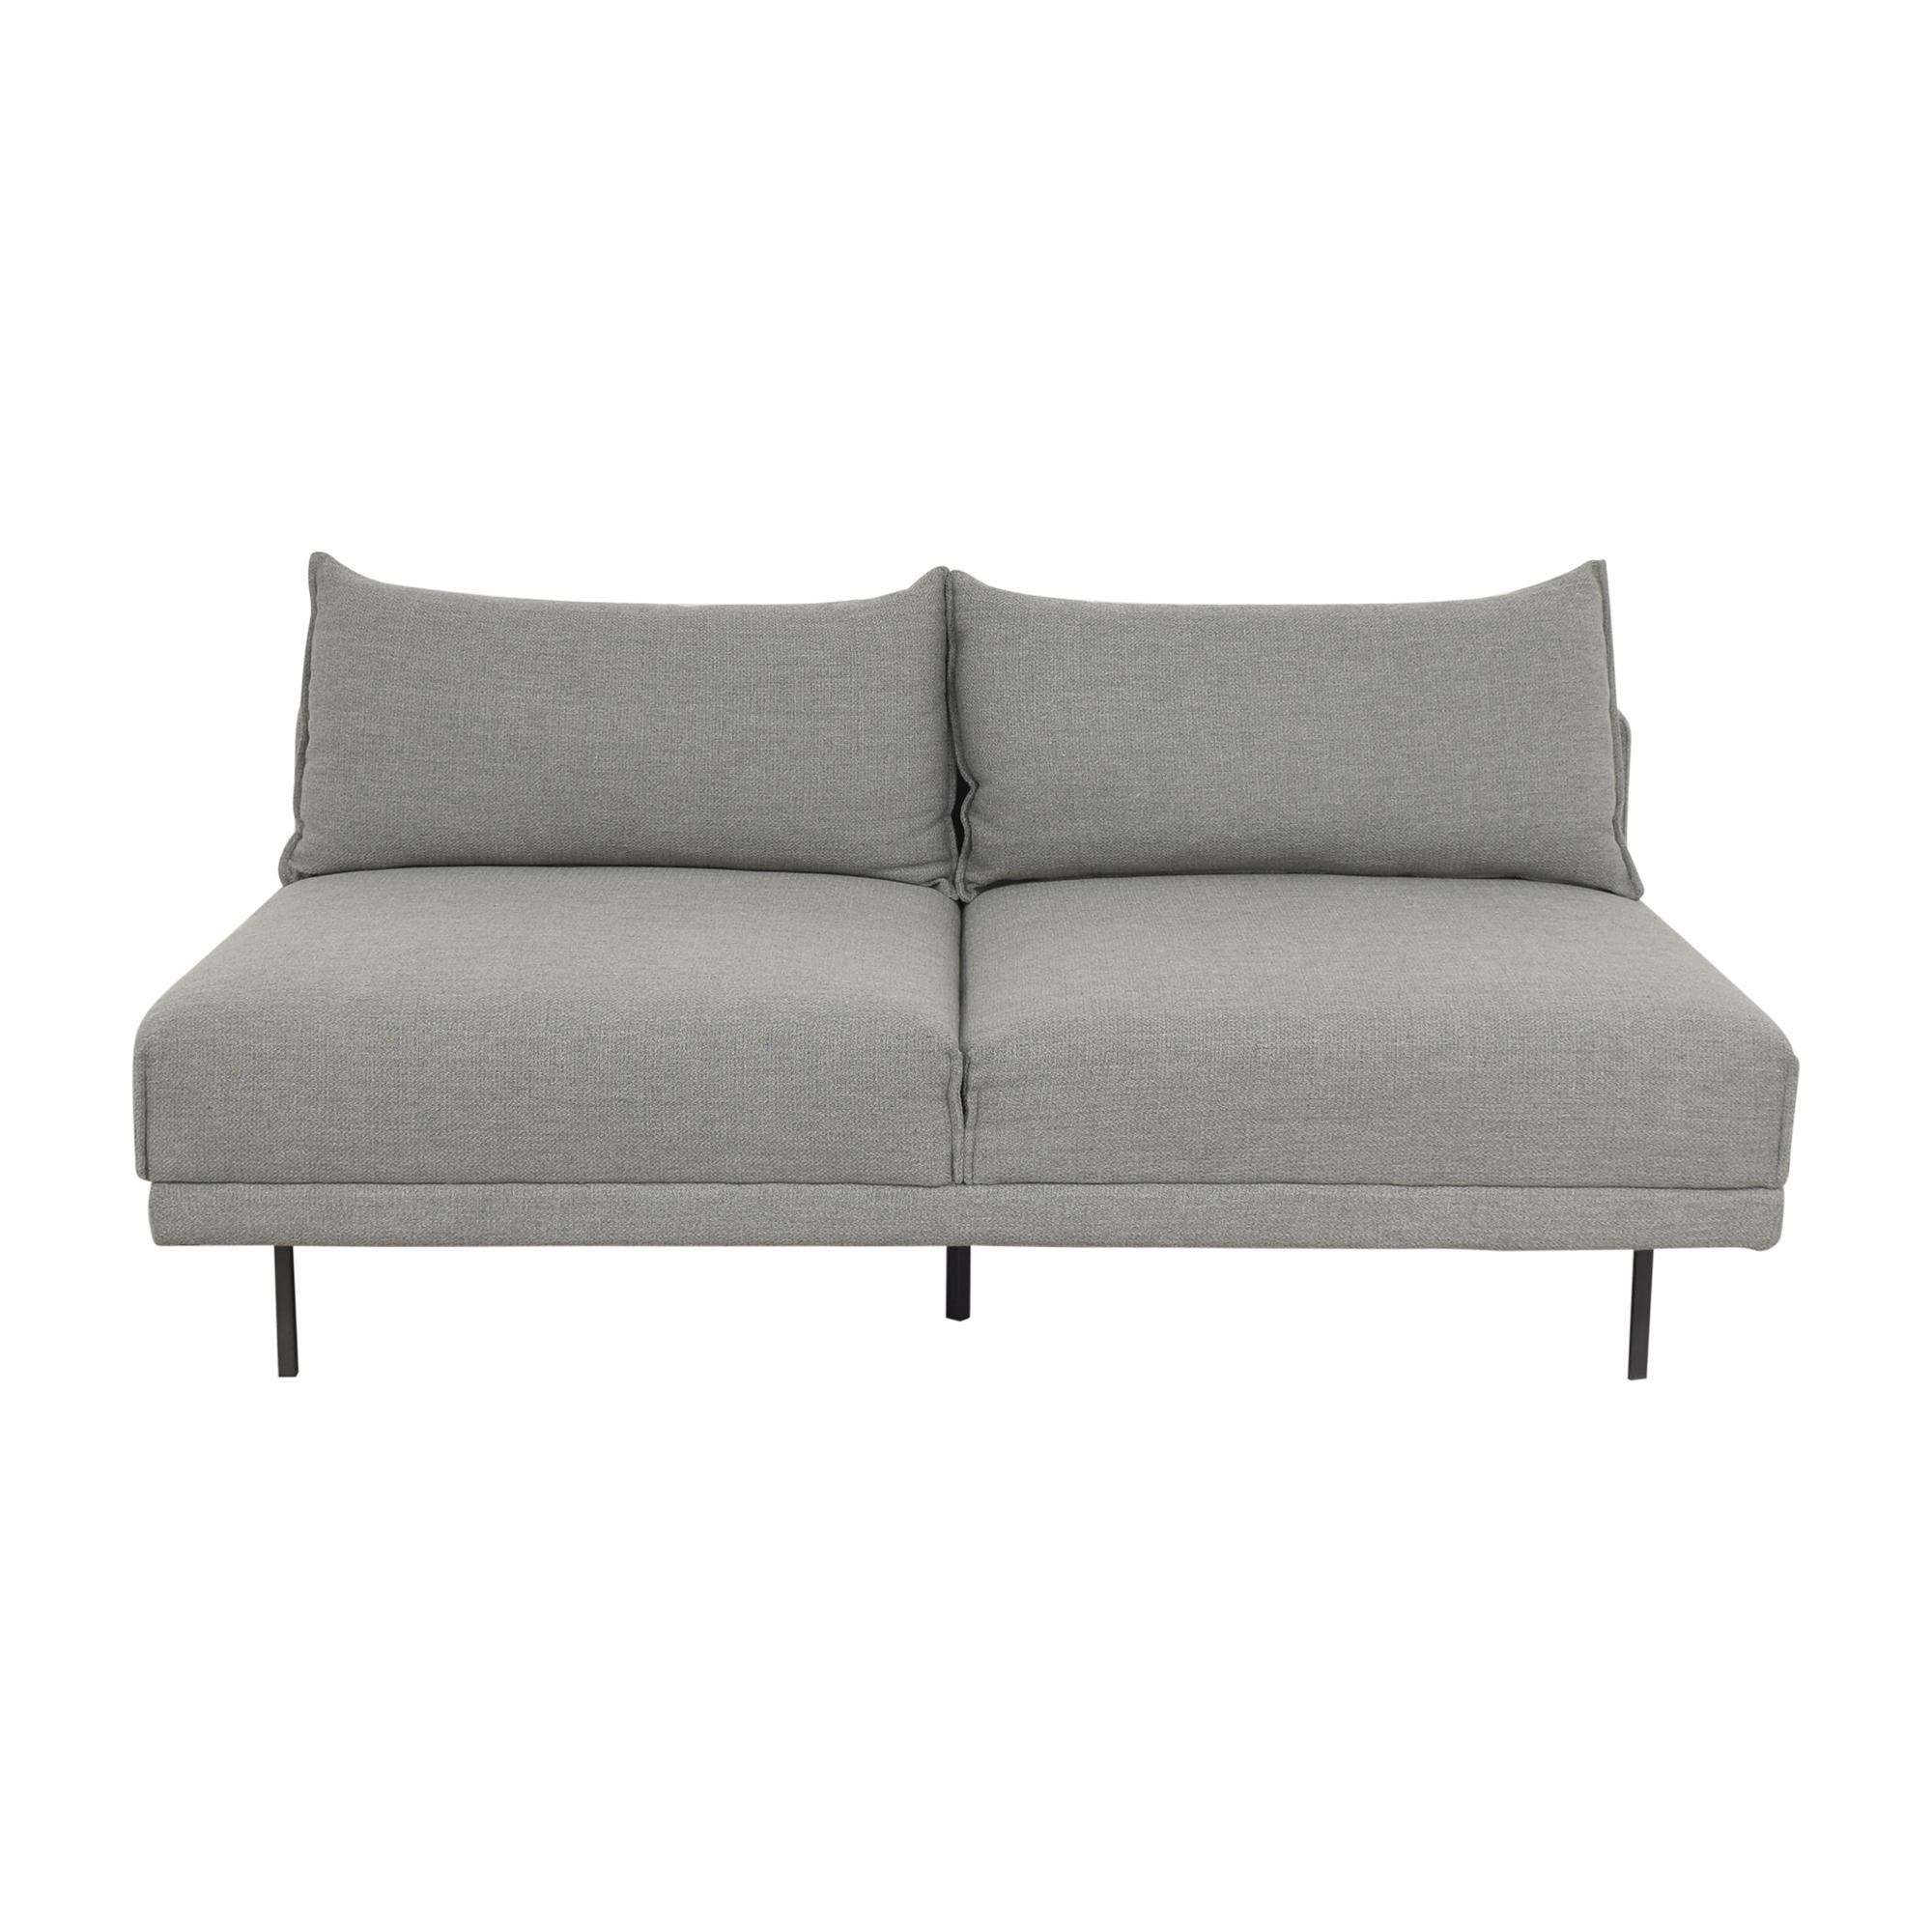 West Elm West Elm Halsey Armless Sofa ct